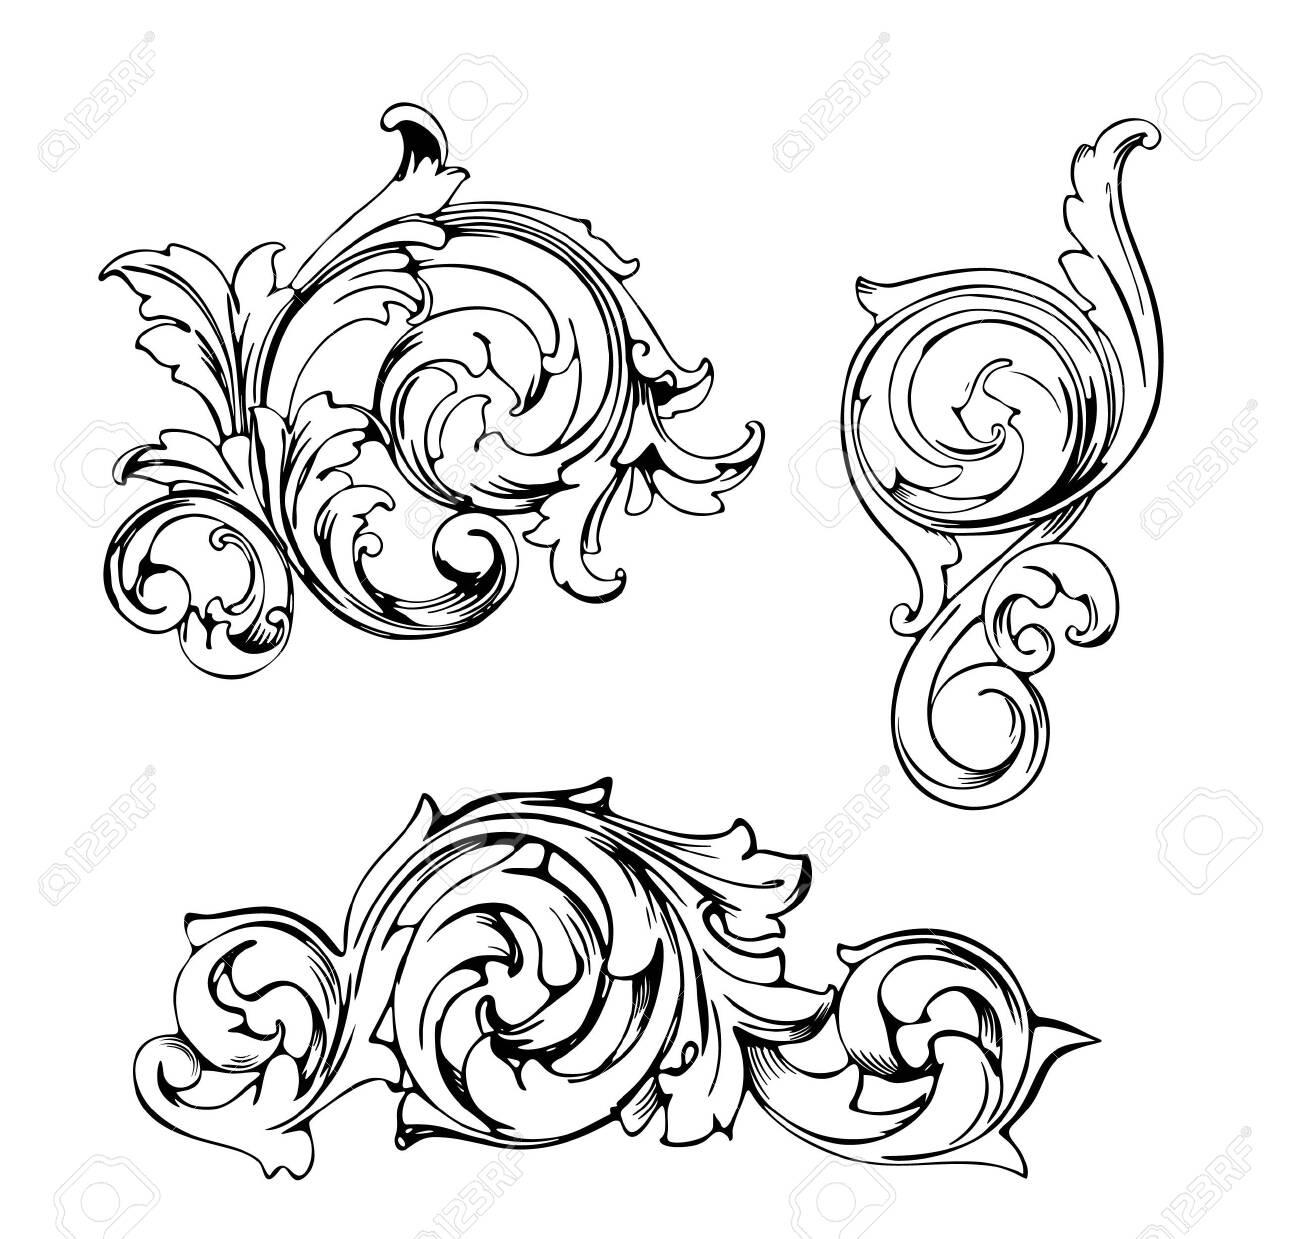 Vintage Baroque Victorian frame border tattoo floral ornament leaf scroll engraved retro flower pattern decorative design tattoo black and white filigree calligraphic vector heraldic swirl set - 149772532